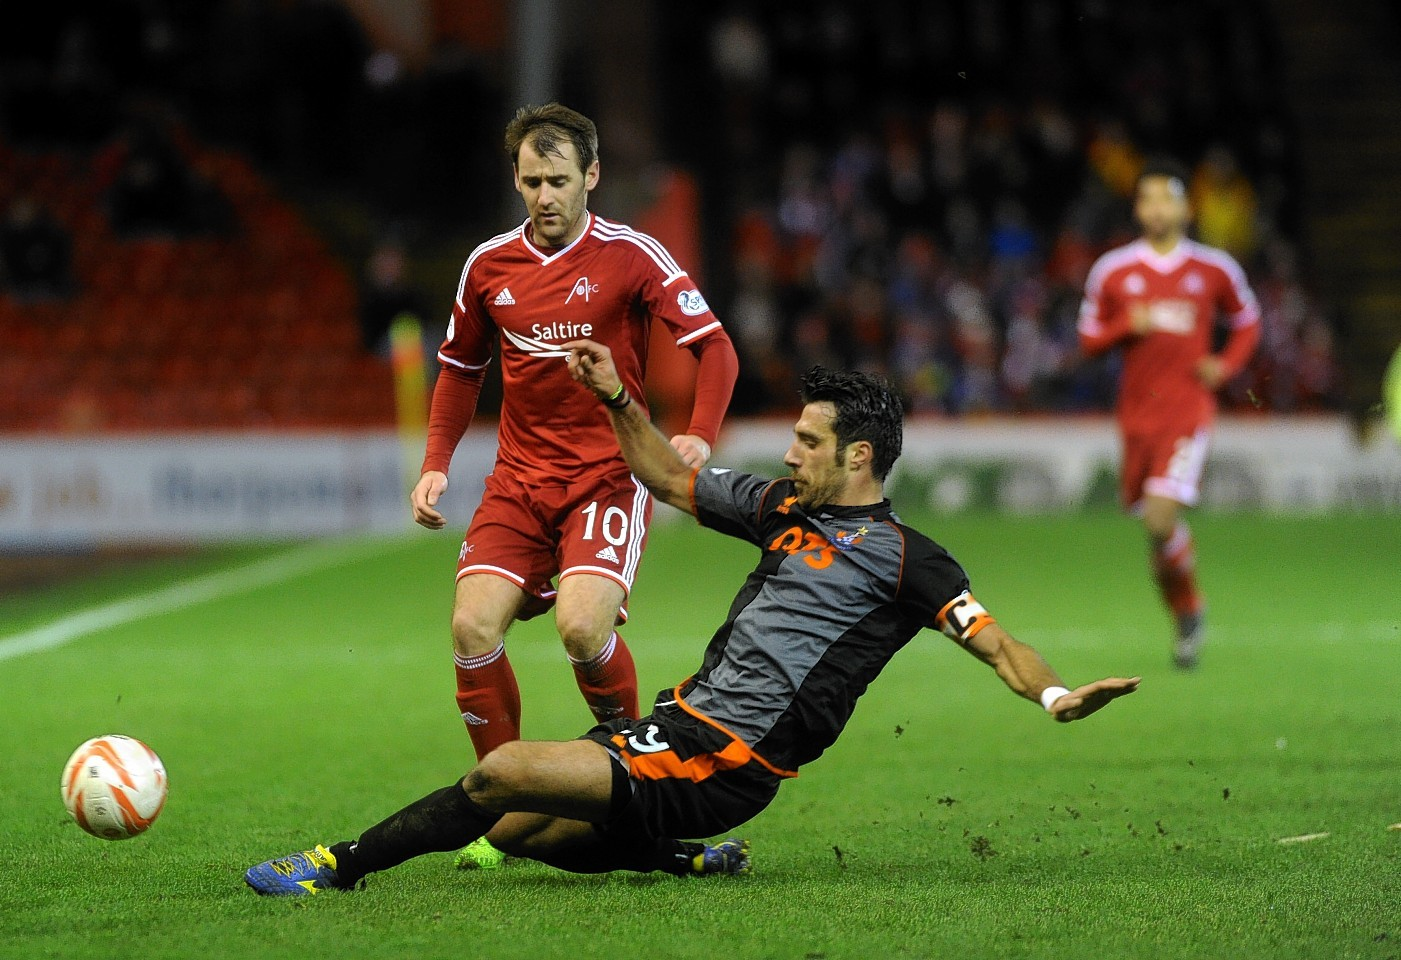 Kilmarnock defender Niall McGinn challenges Dons attacker Niall McGinn